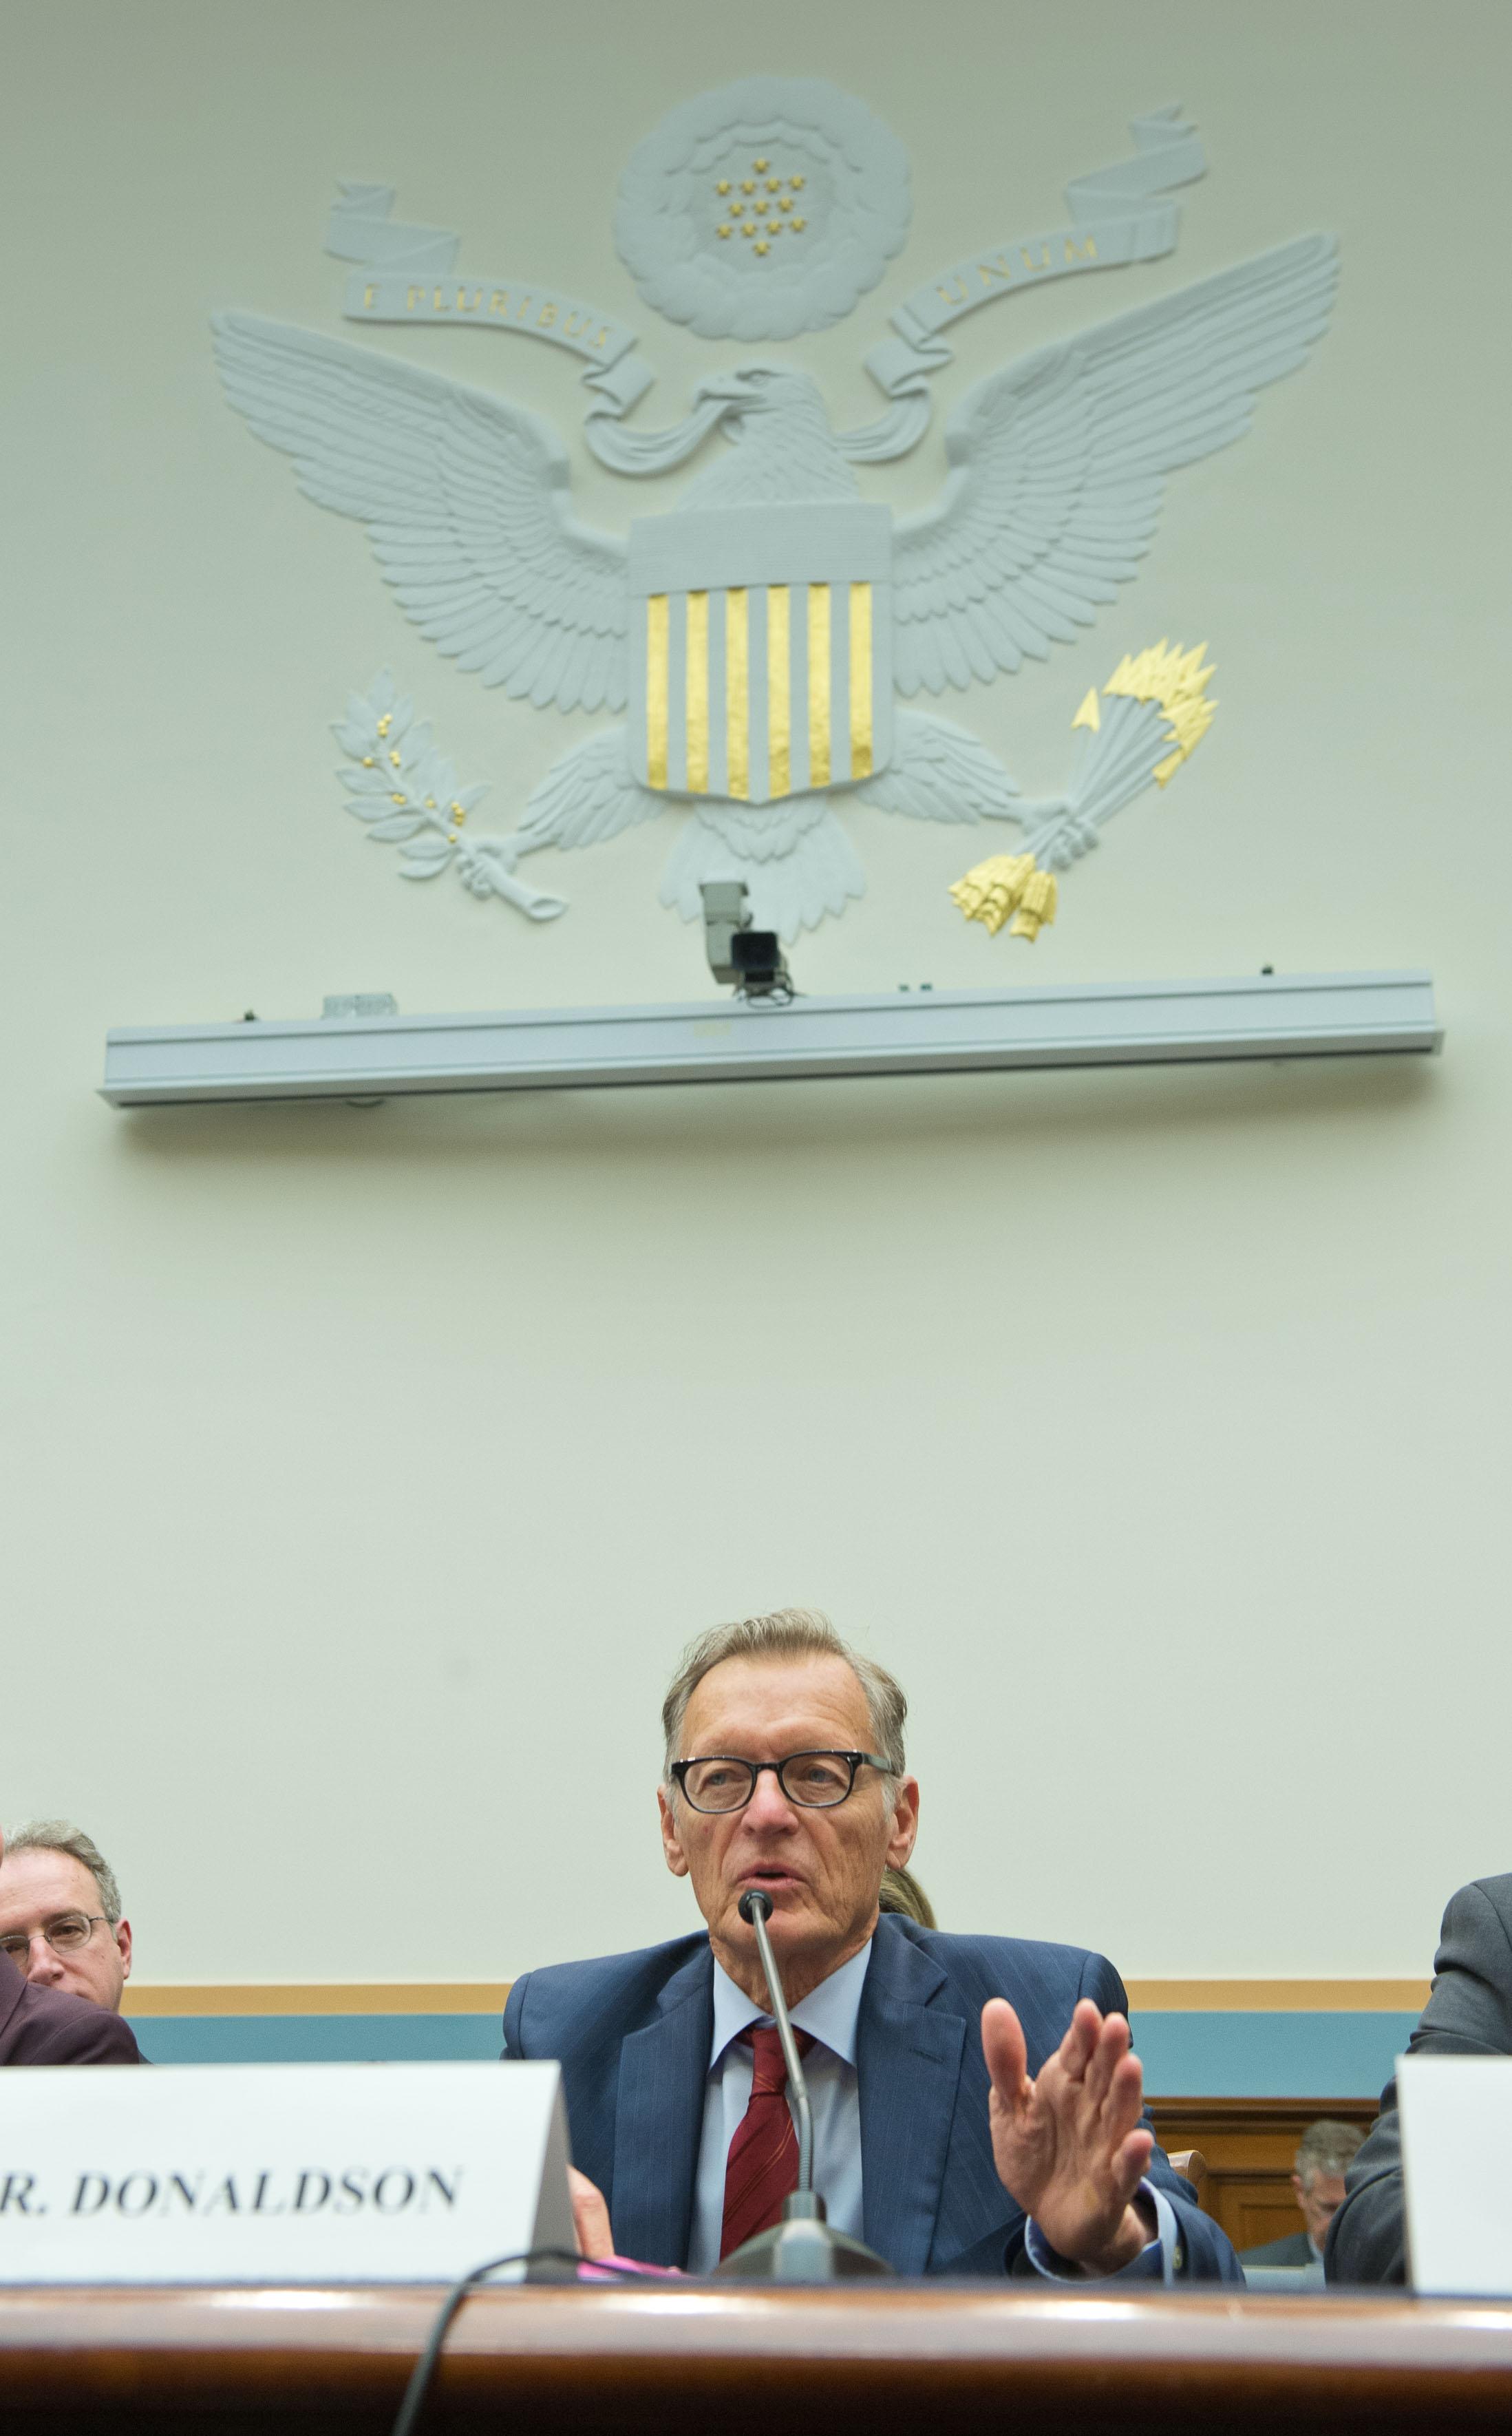 Michael C. Donaldson testifies before Congress, April 2, 2014.